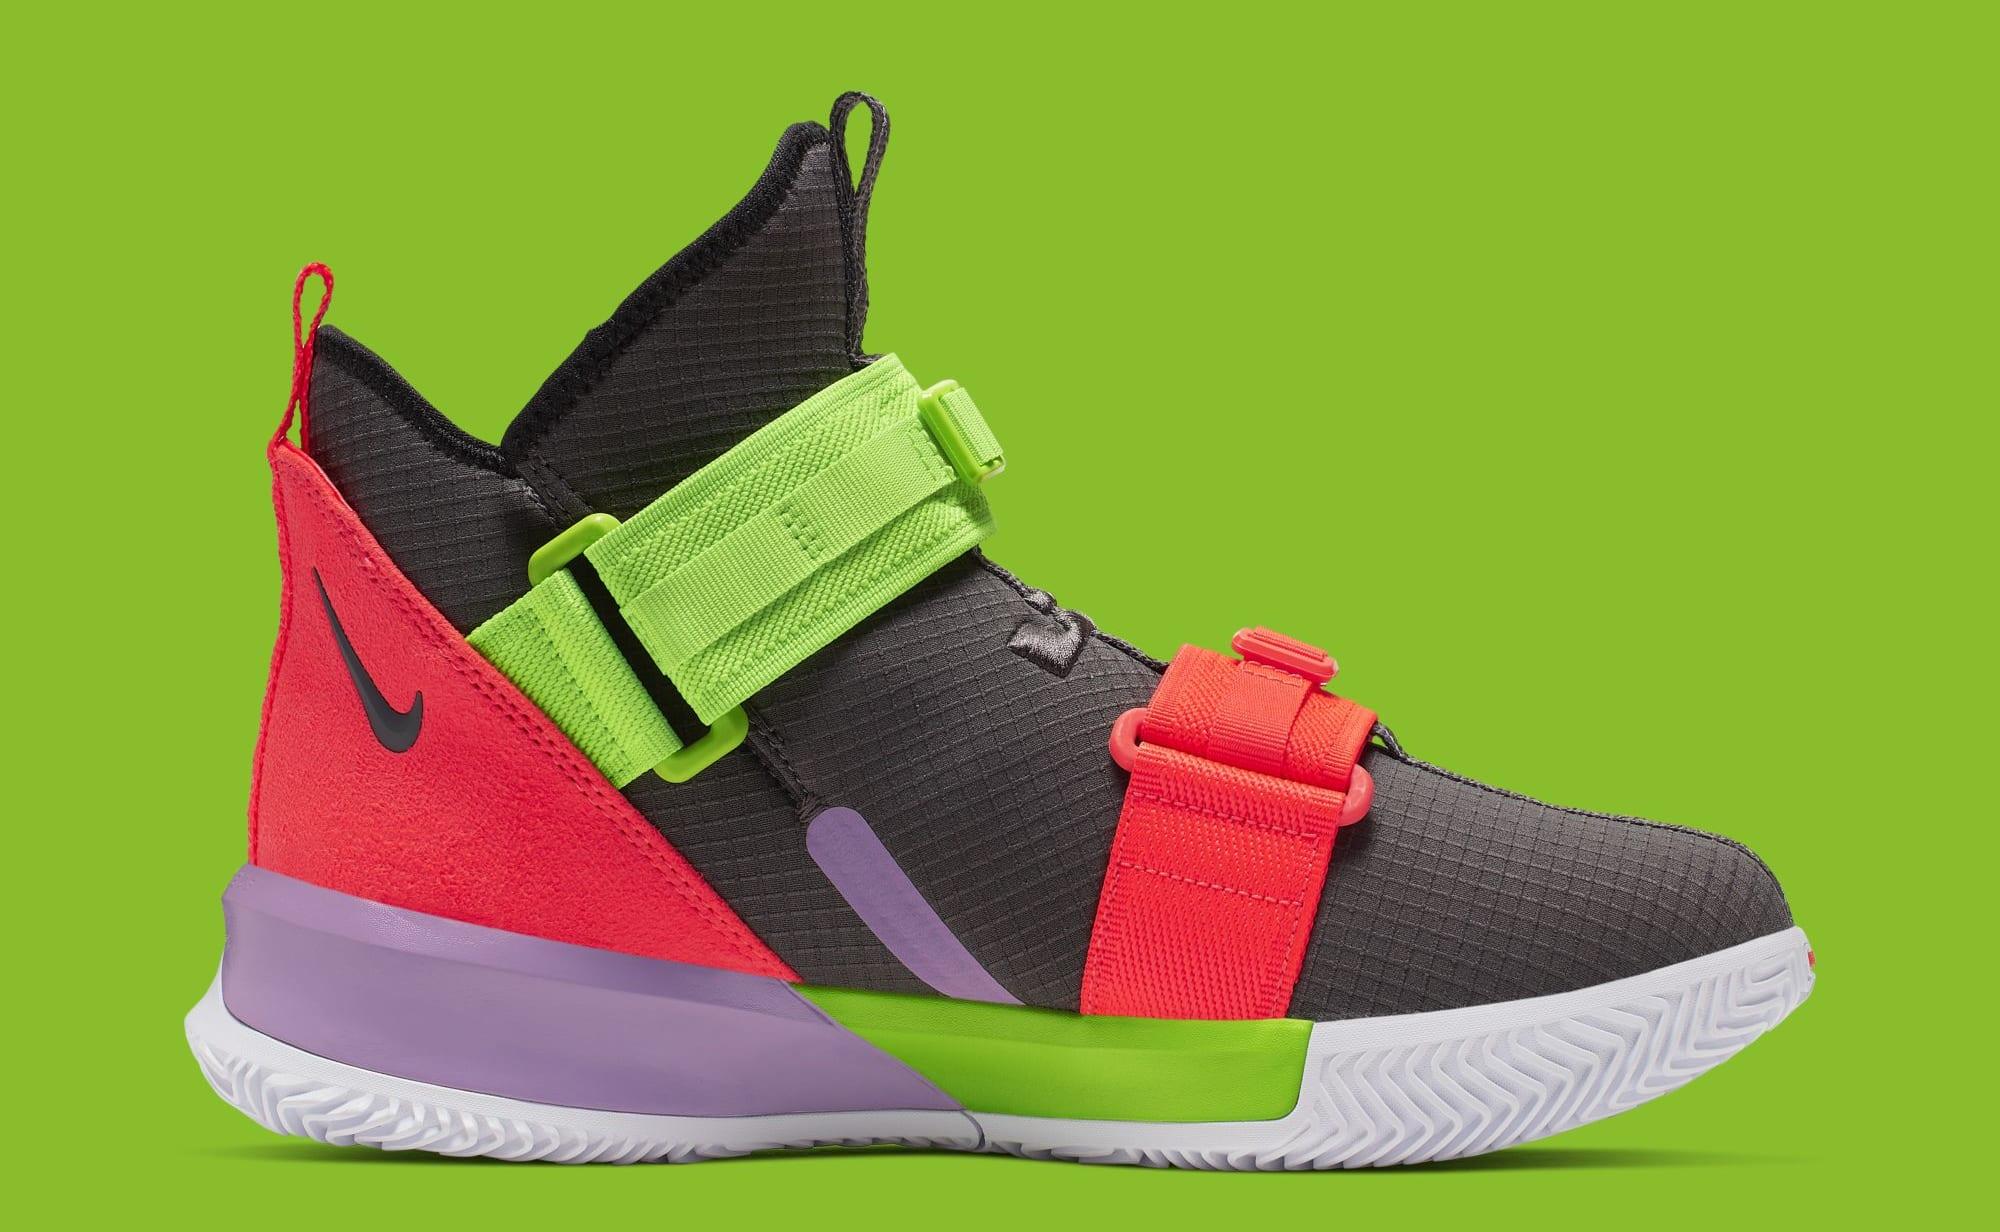 Nike LeBron Soldier 13 AR4228-002 (Medial)